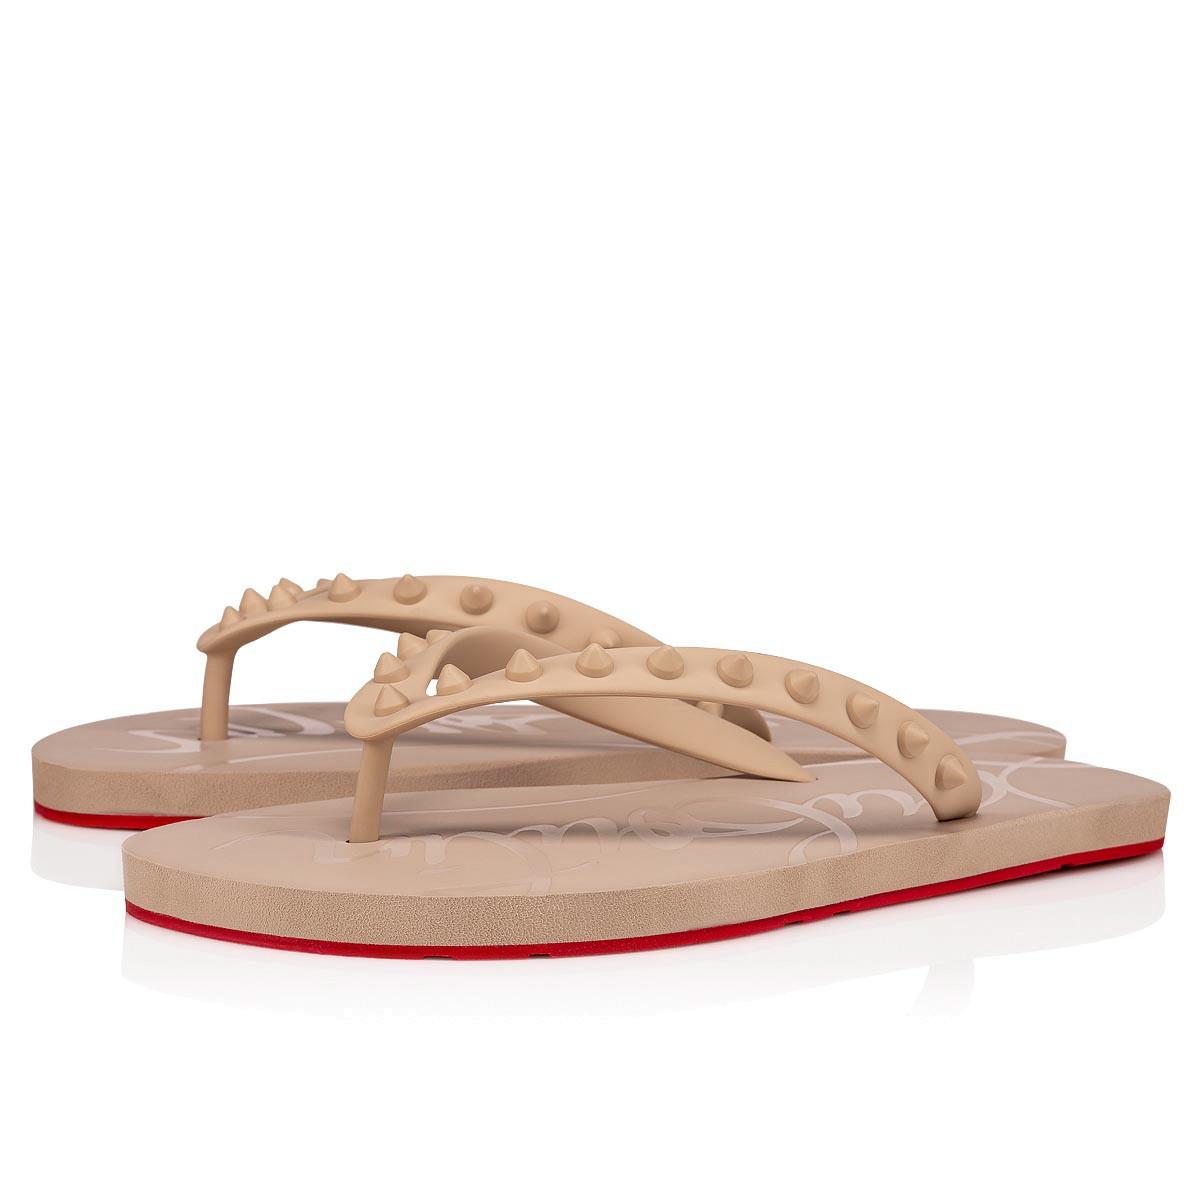 Shoes - Loubi Flip Donna Flat - Christian Louboutin